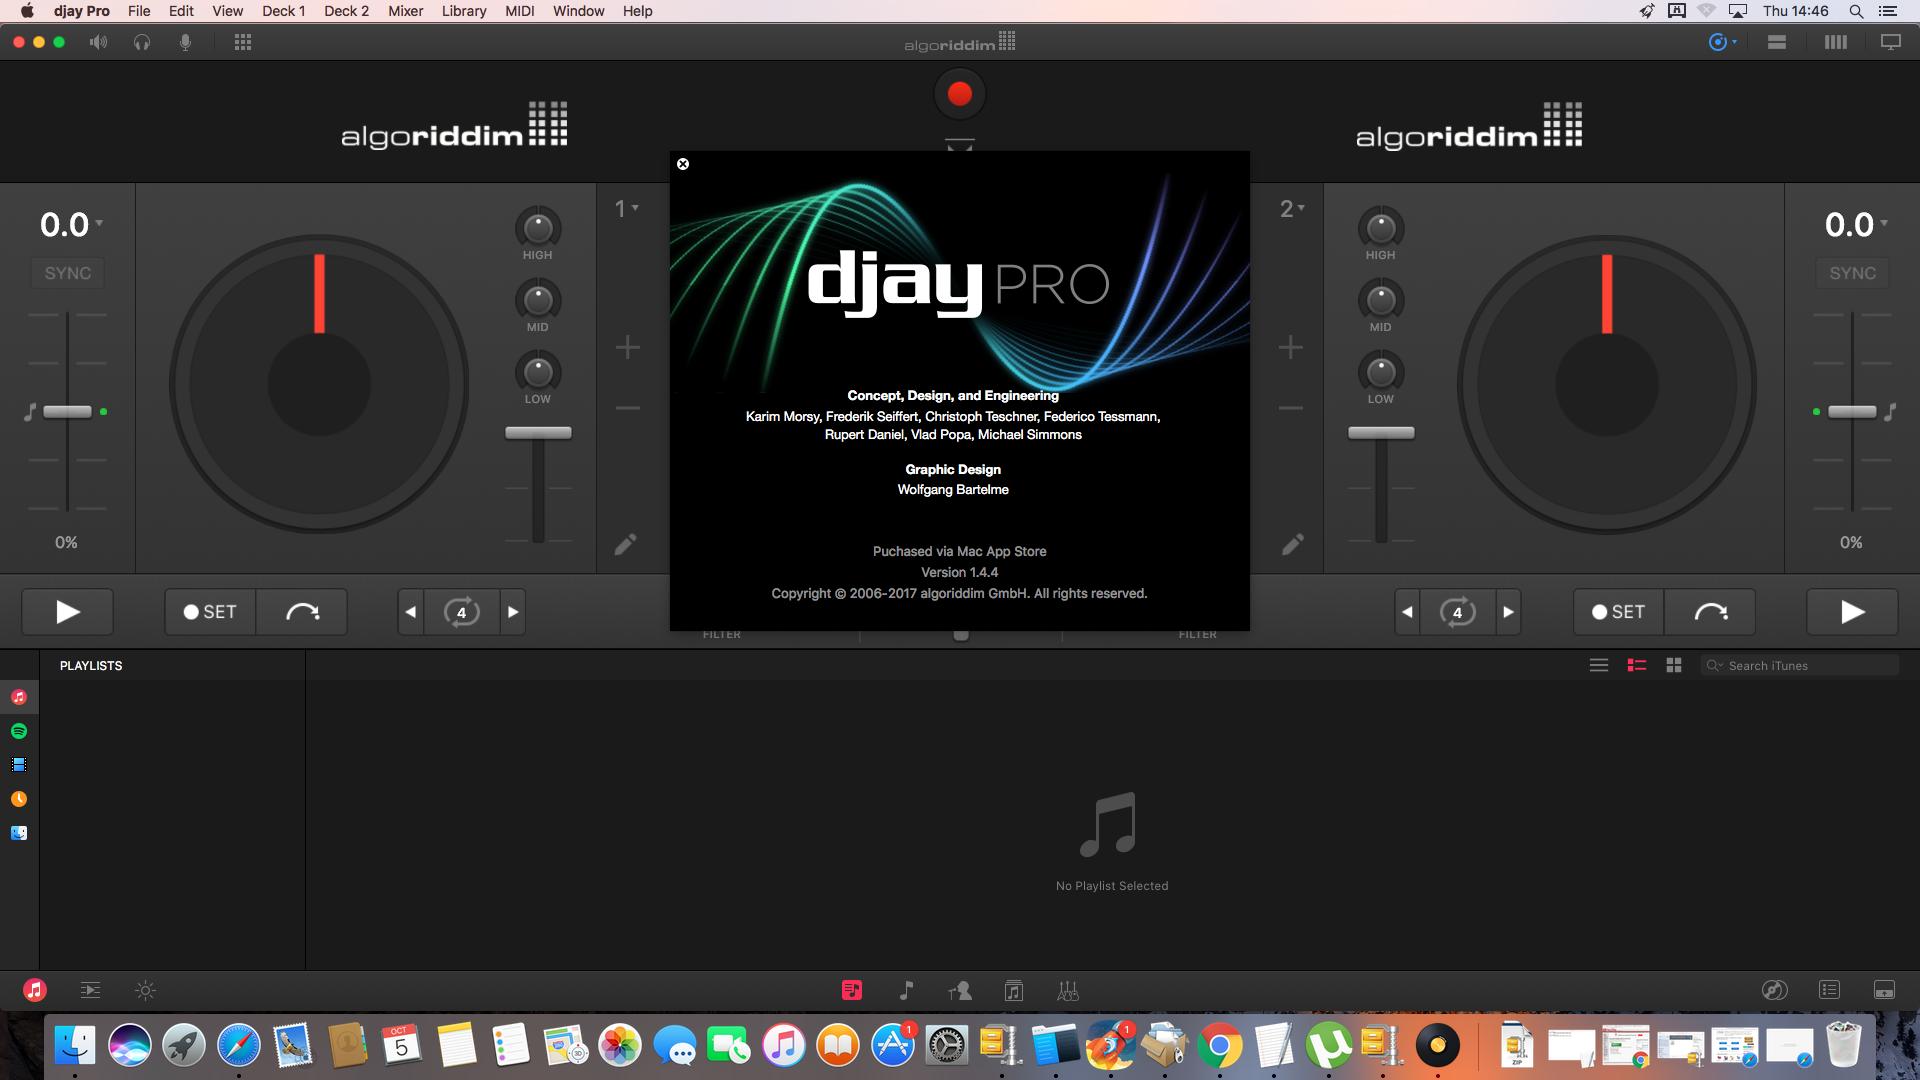 djay FX Pro